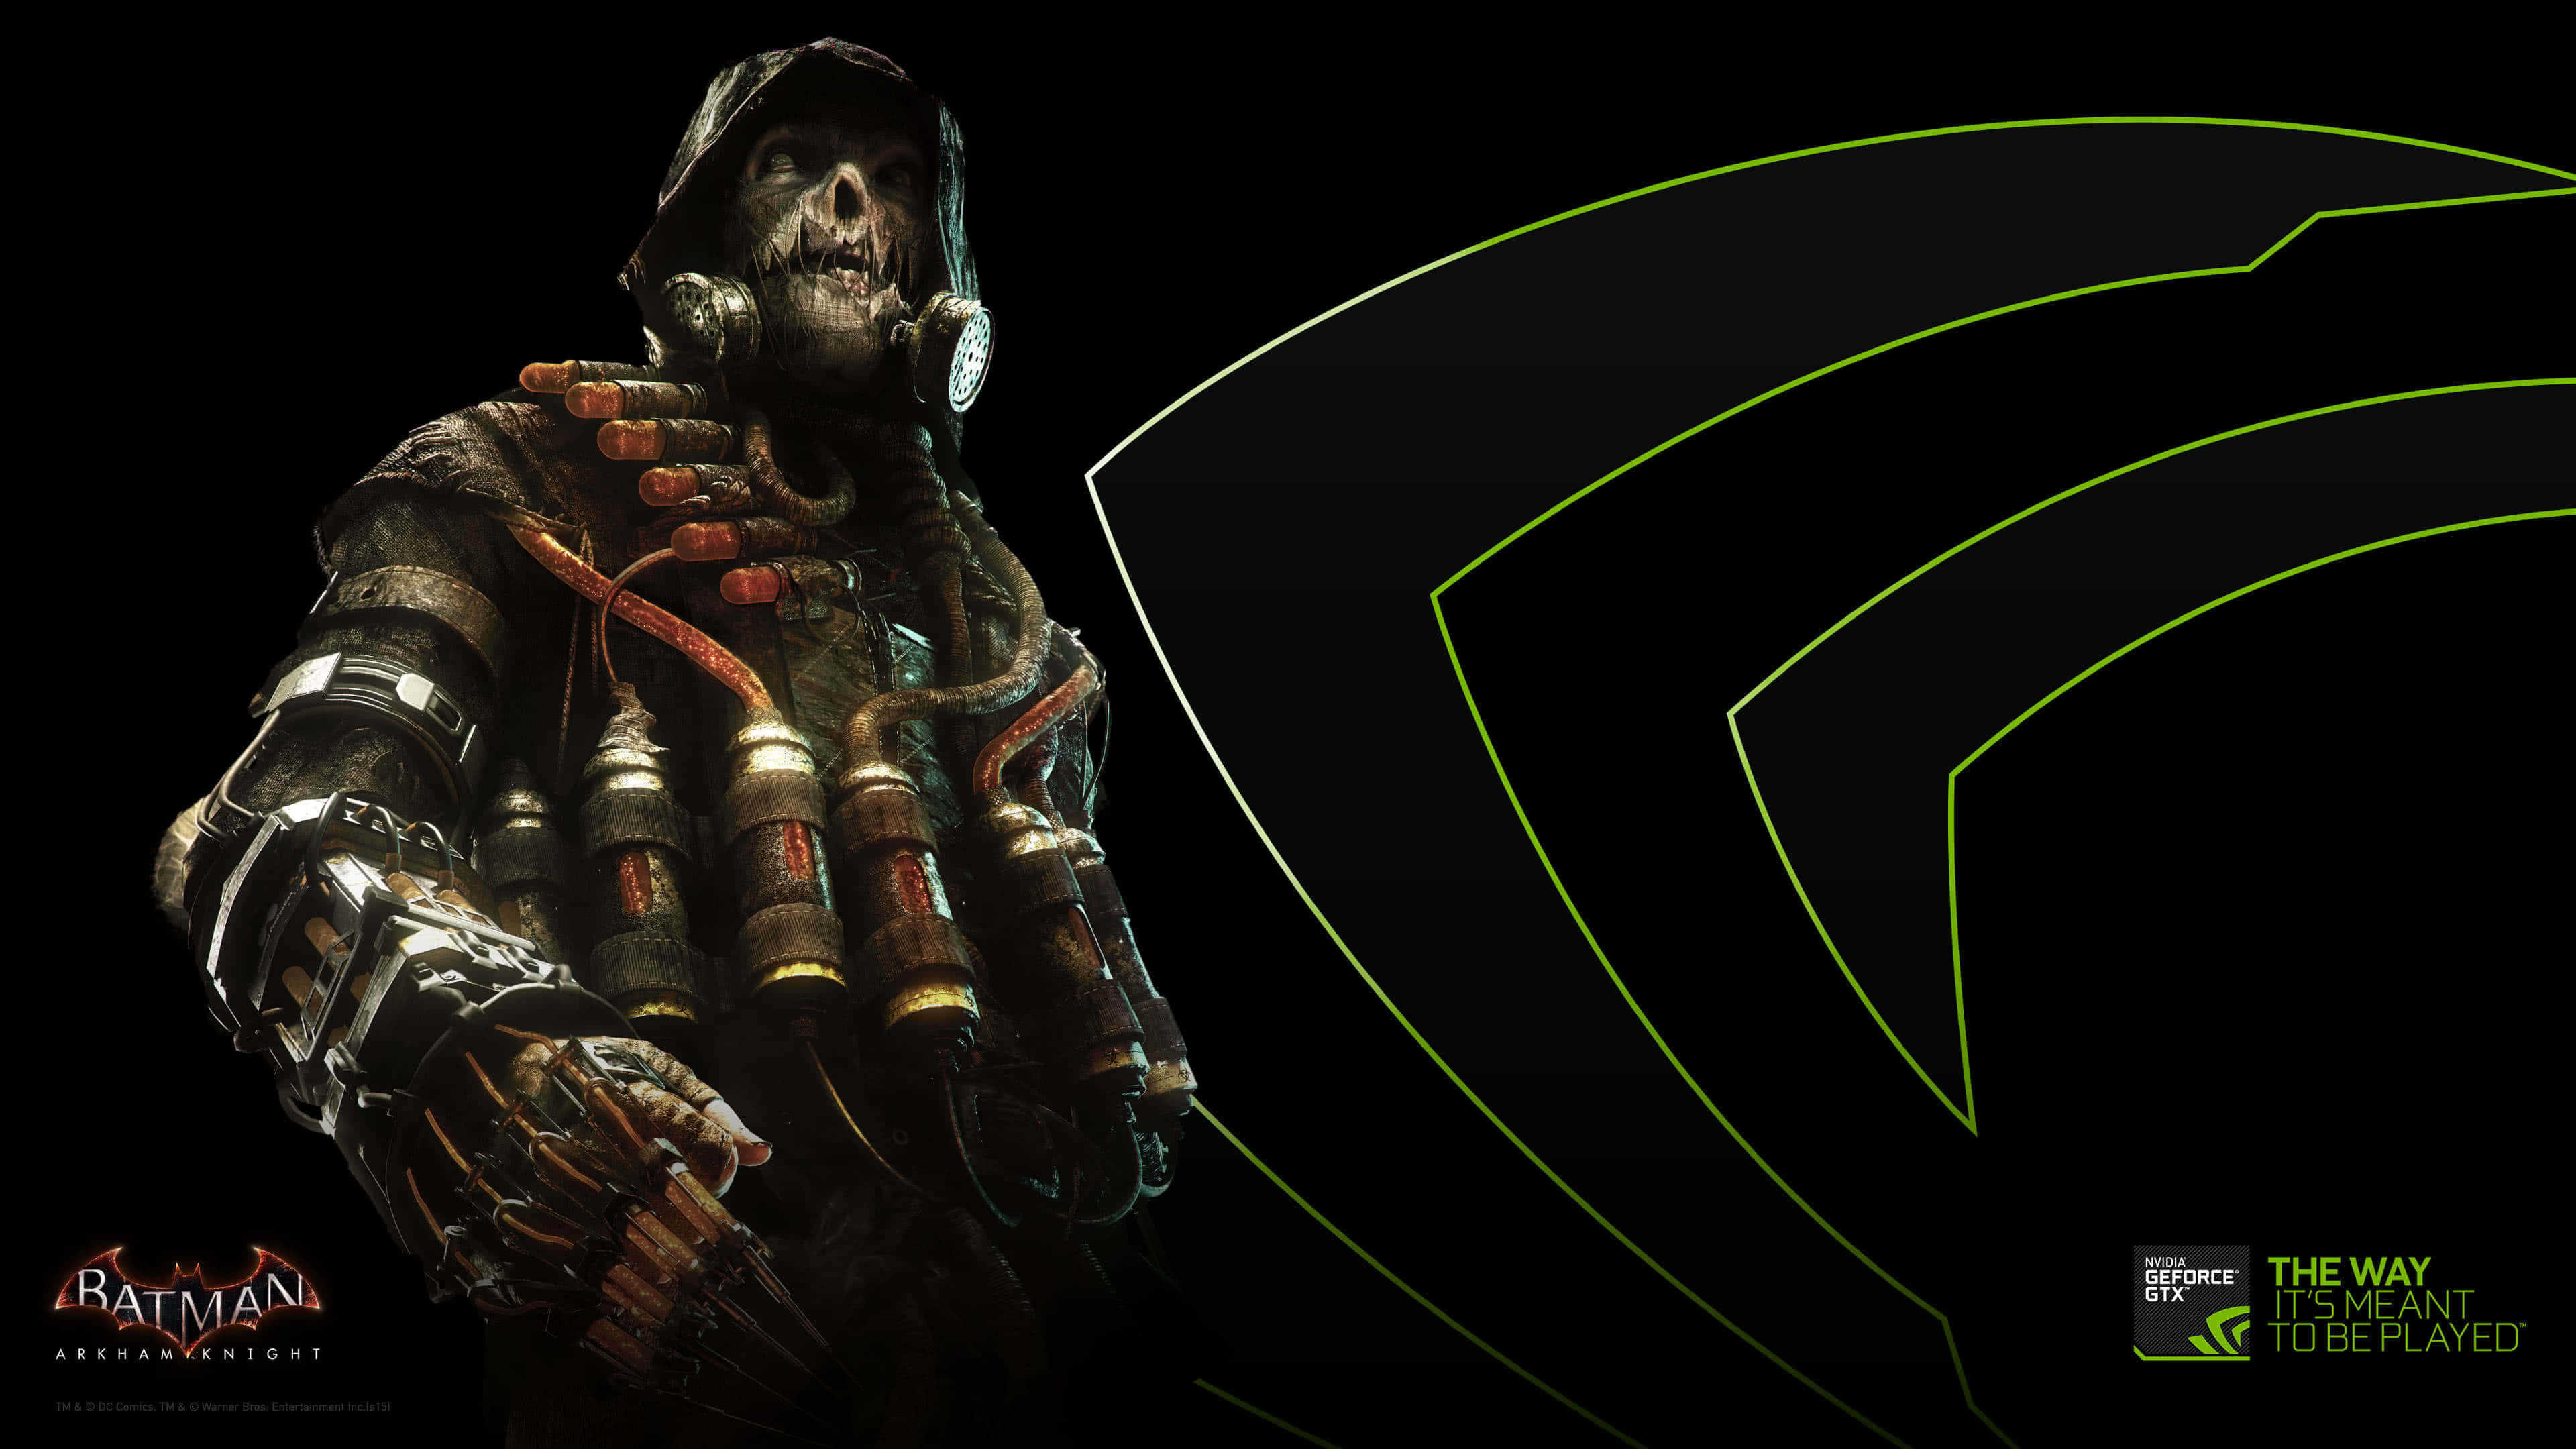 nvidia scarecrow arkham knight uhd 4k wallpaper | pixelz